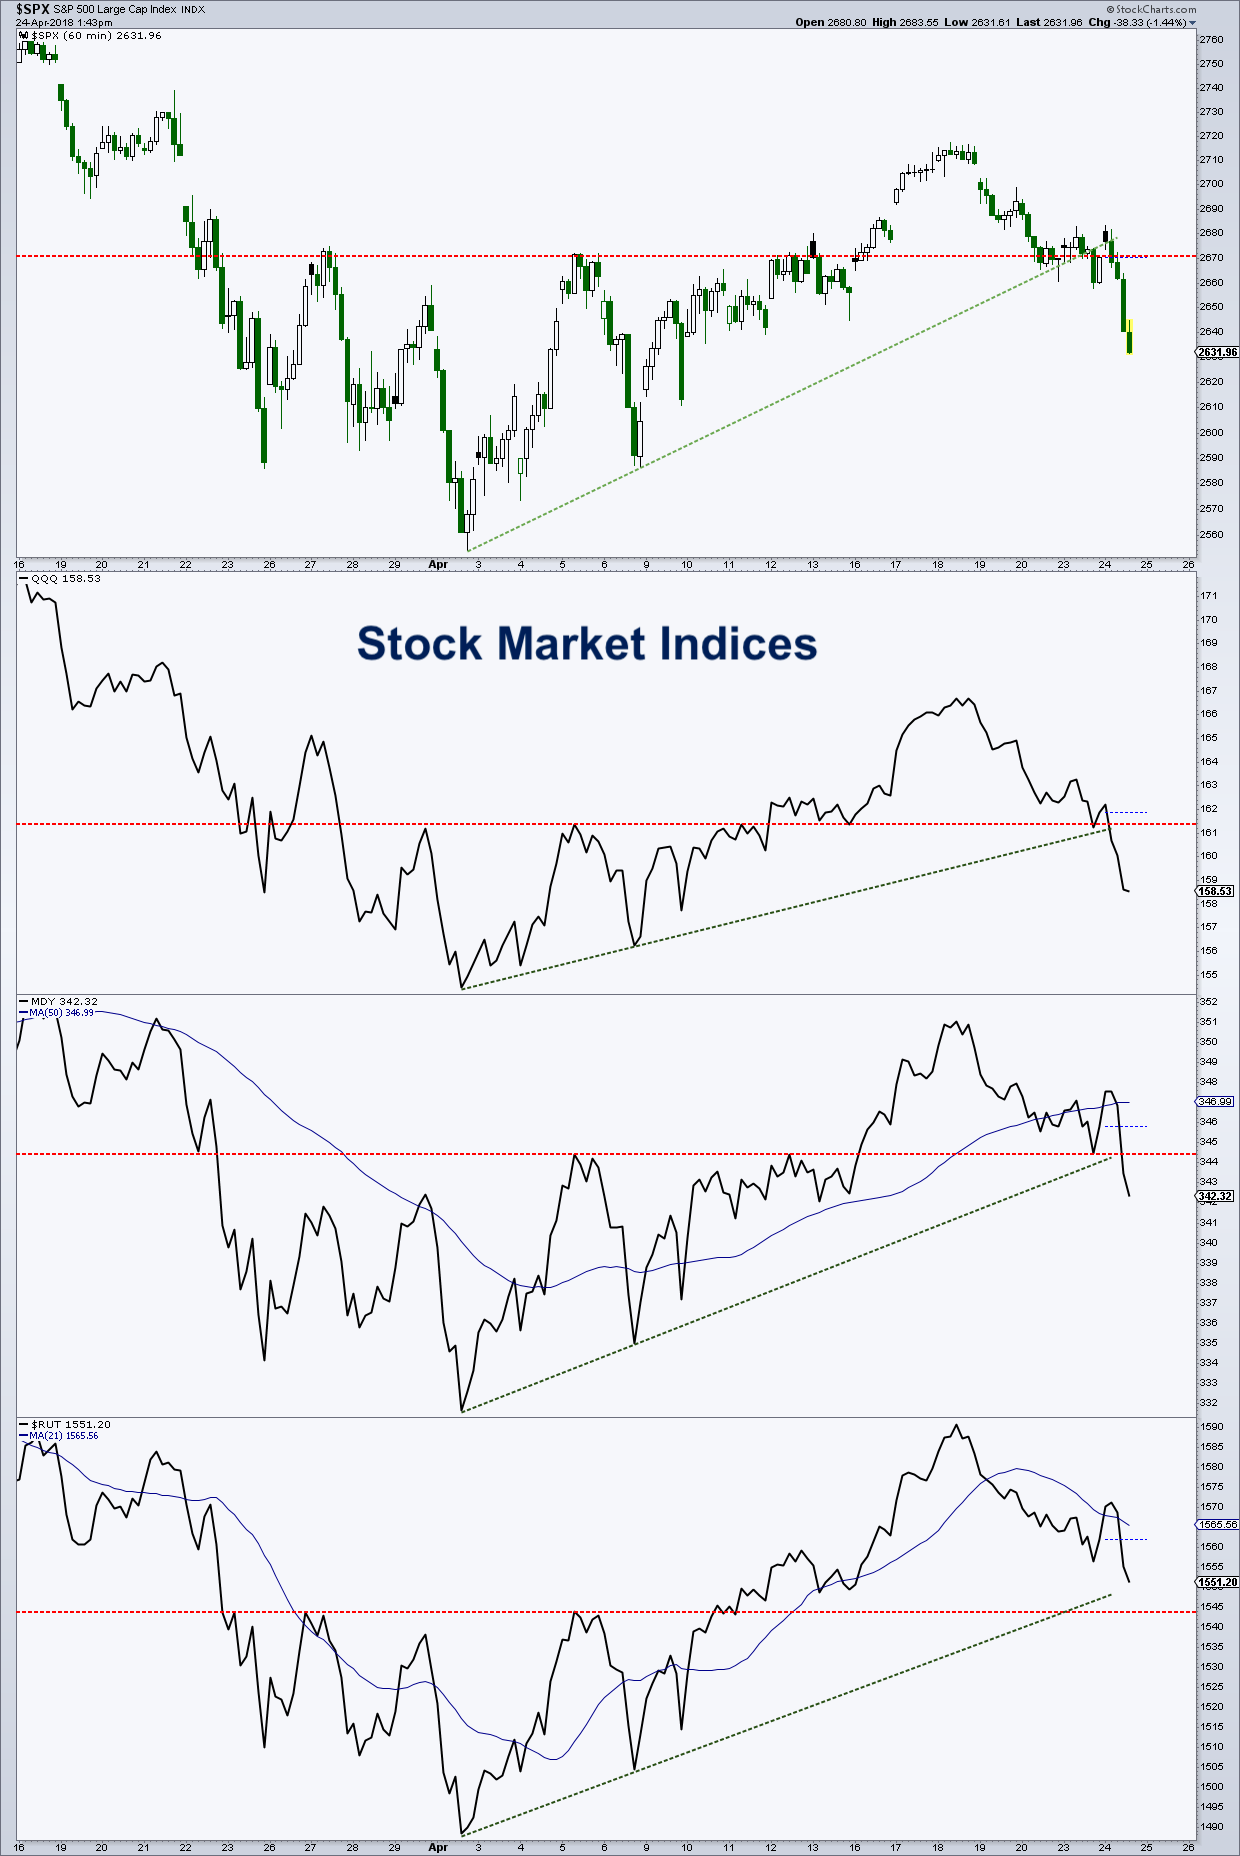 stock market indices broken trend lines bearish chart_24 april 2018